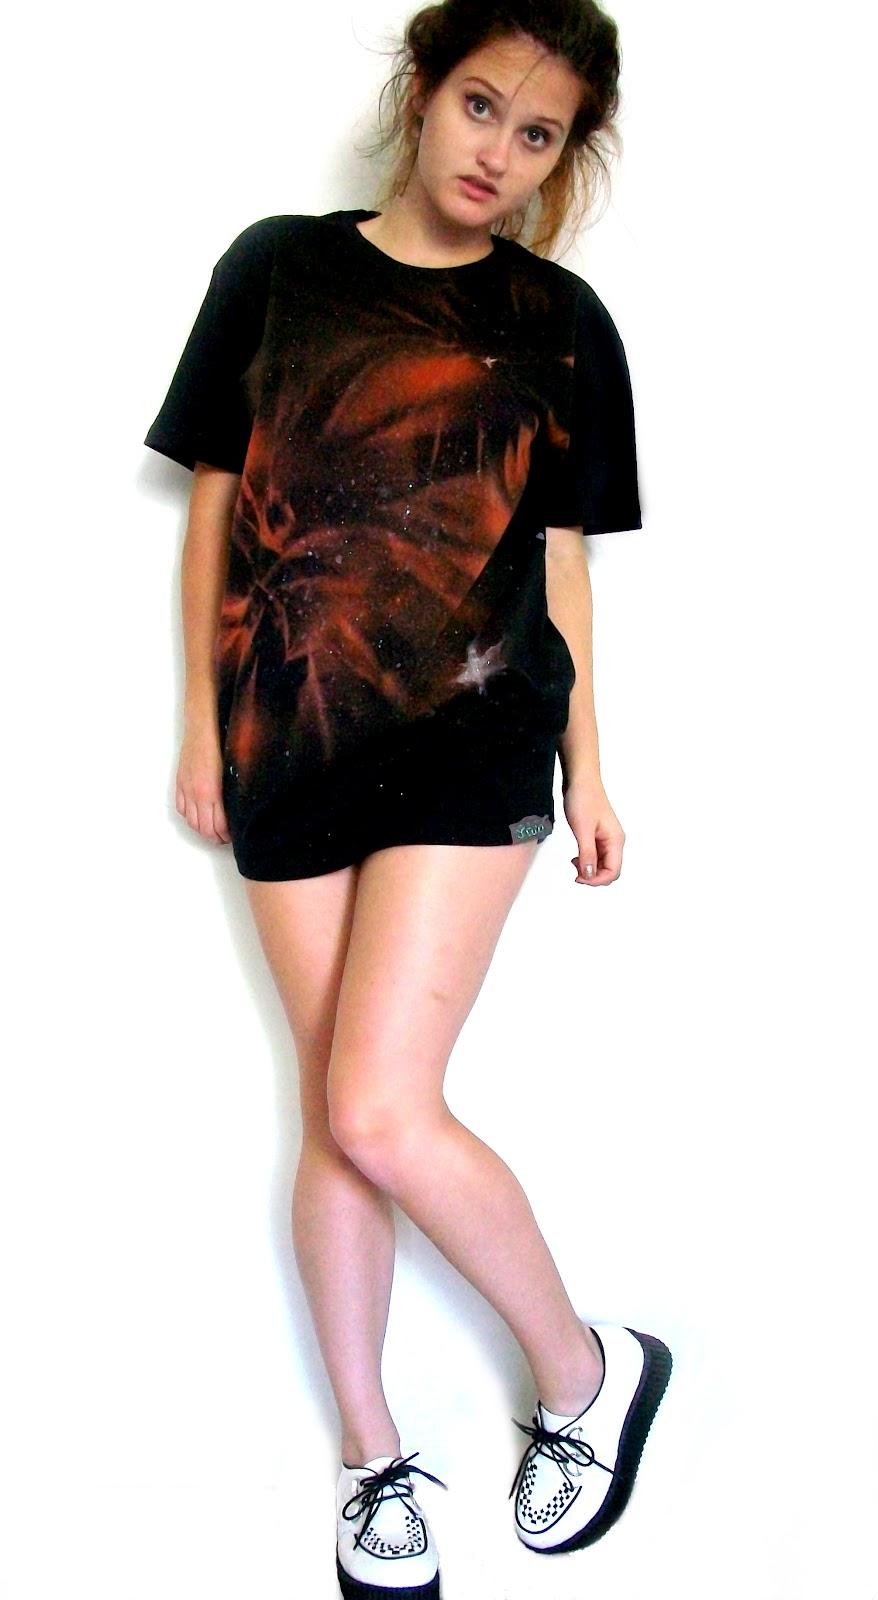 diy nebula shirt - photo #21